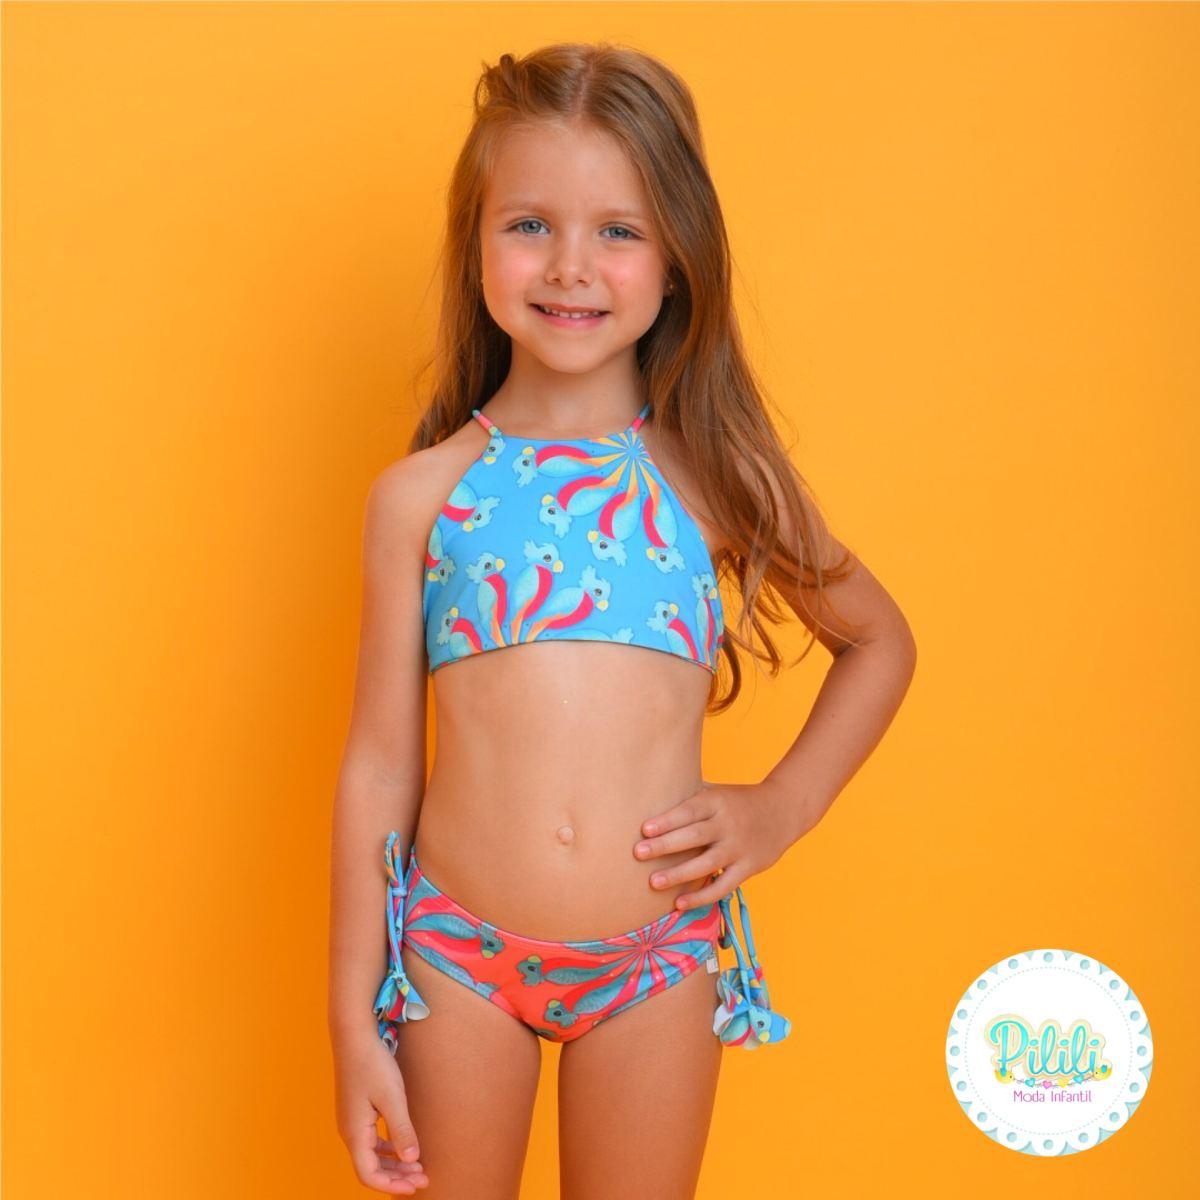 Biquini Infantil Magah Beach Wear Adriana Dupla Face Cacatua